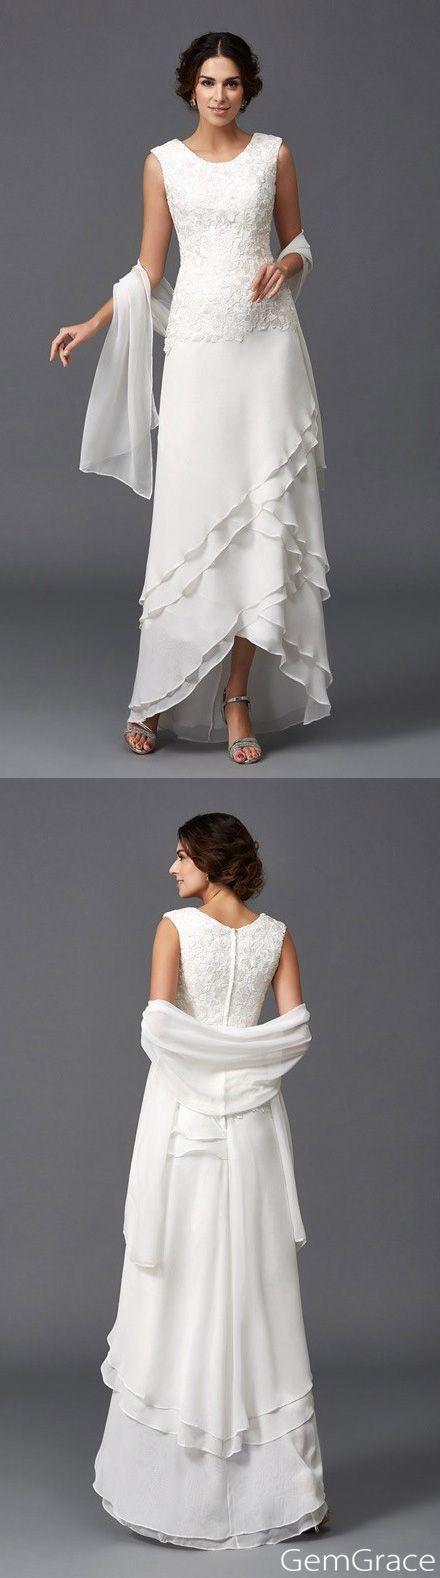 Best 25+ Older bride ideas on Pinterest | Wedding dress ...